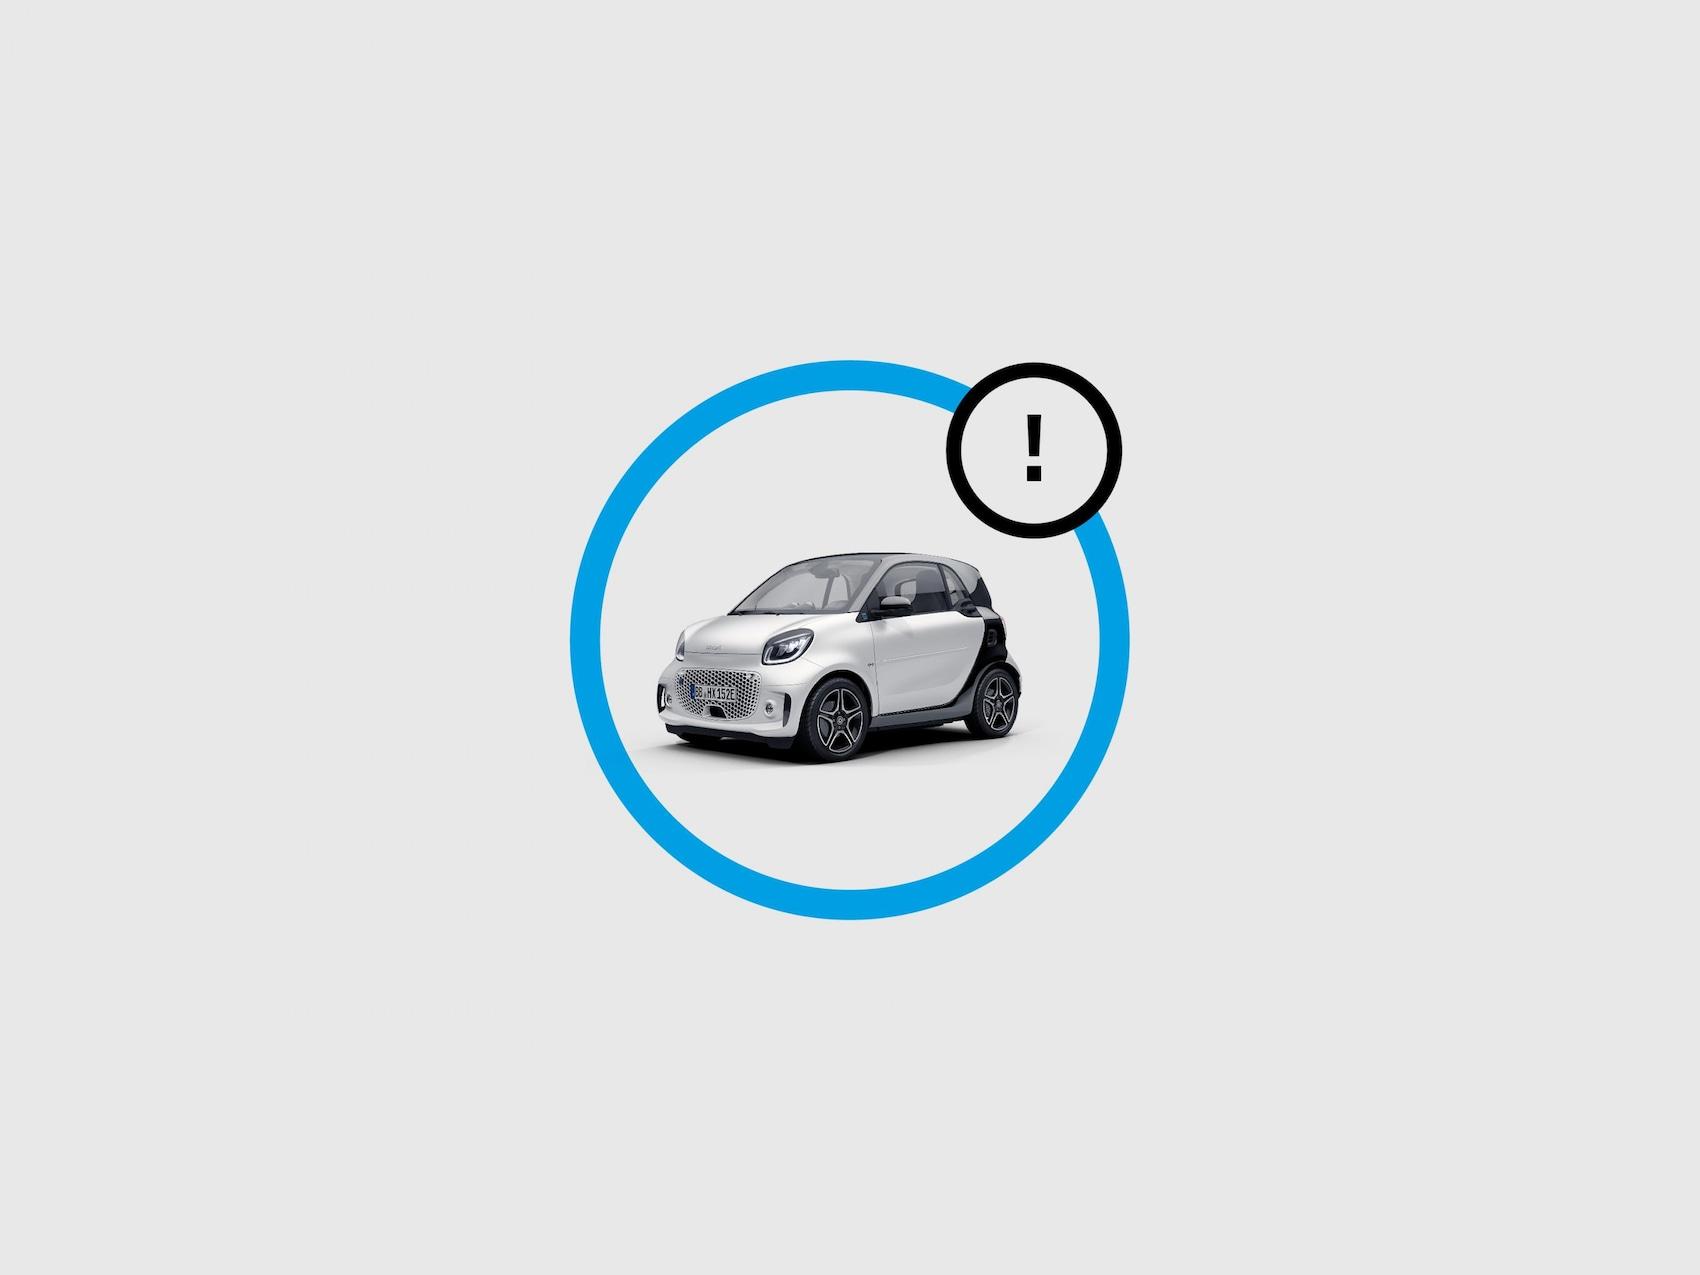 Illustration showing smart EQ control app status messages.